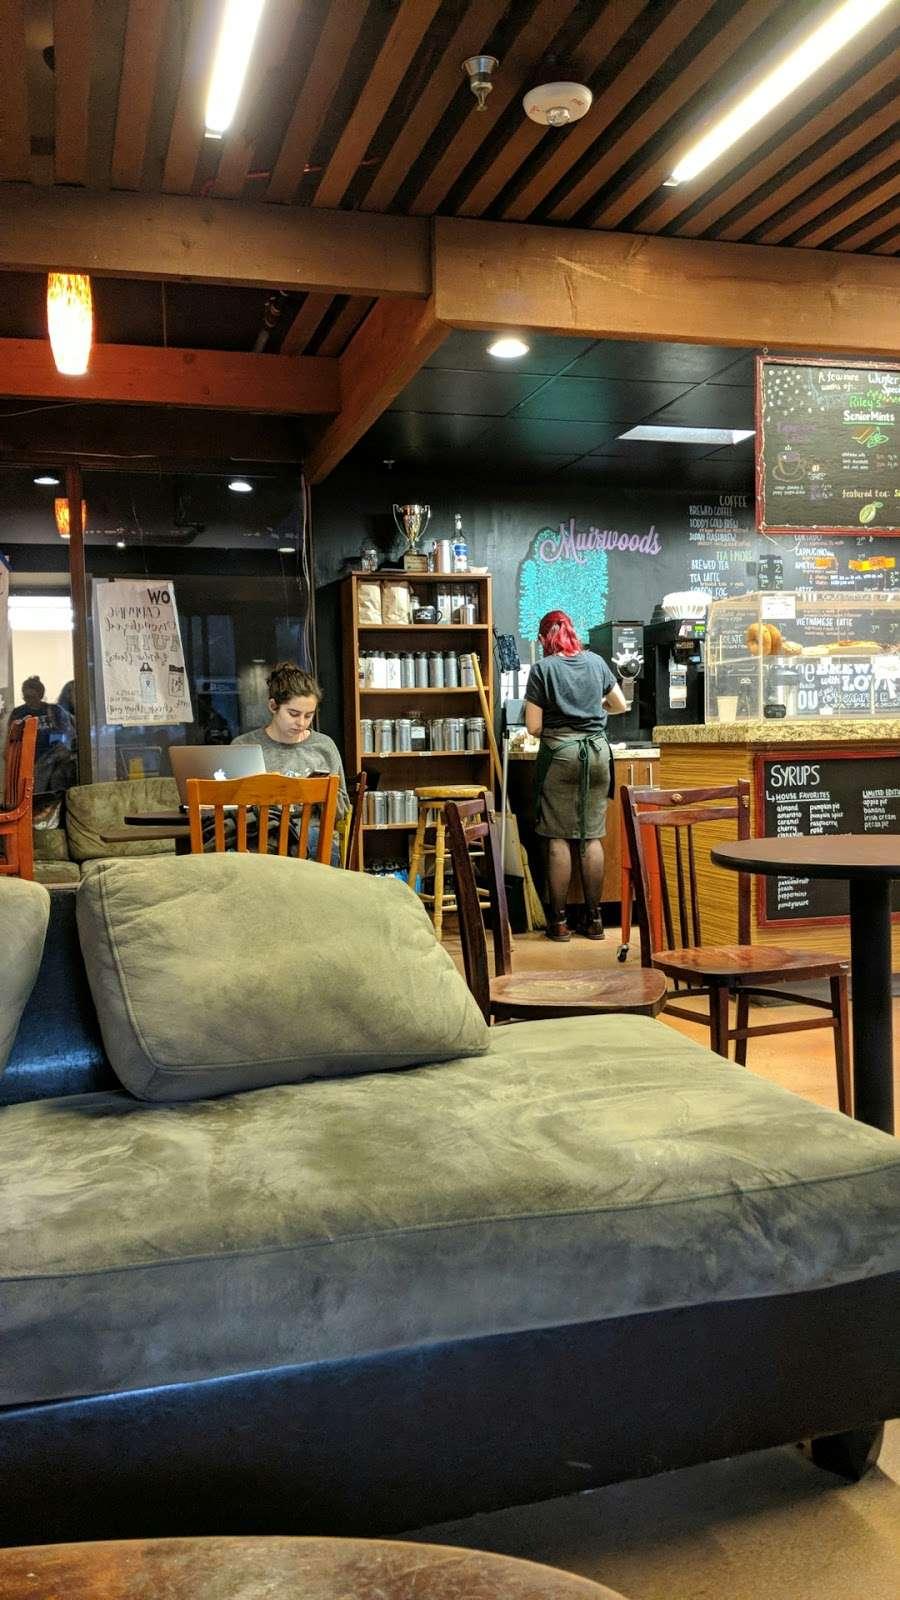 Muir Woods Coffee House - cafe  | Photo 6 of 10 | Address: 9500 Gilman Dr, La Jolla, CA 92093, USA